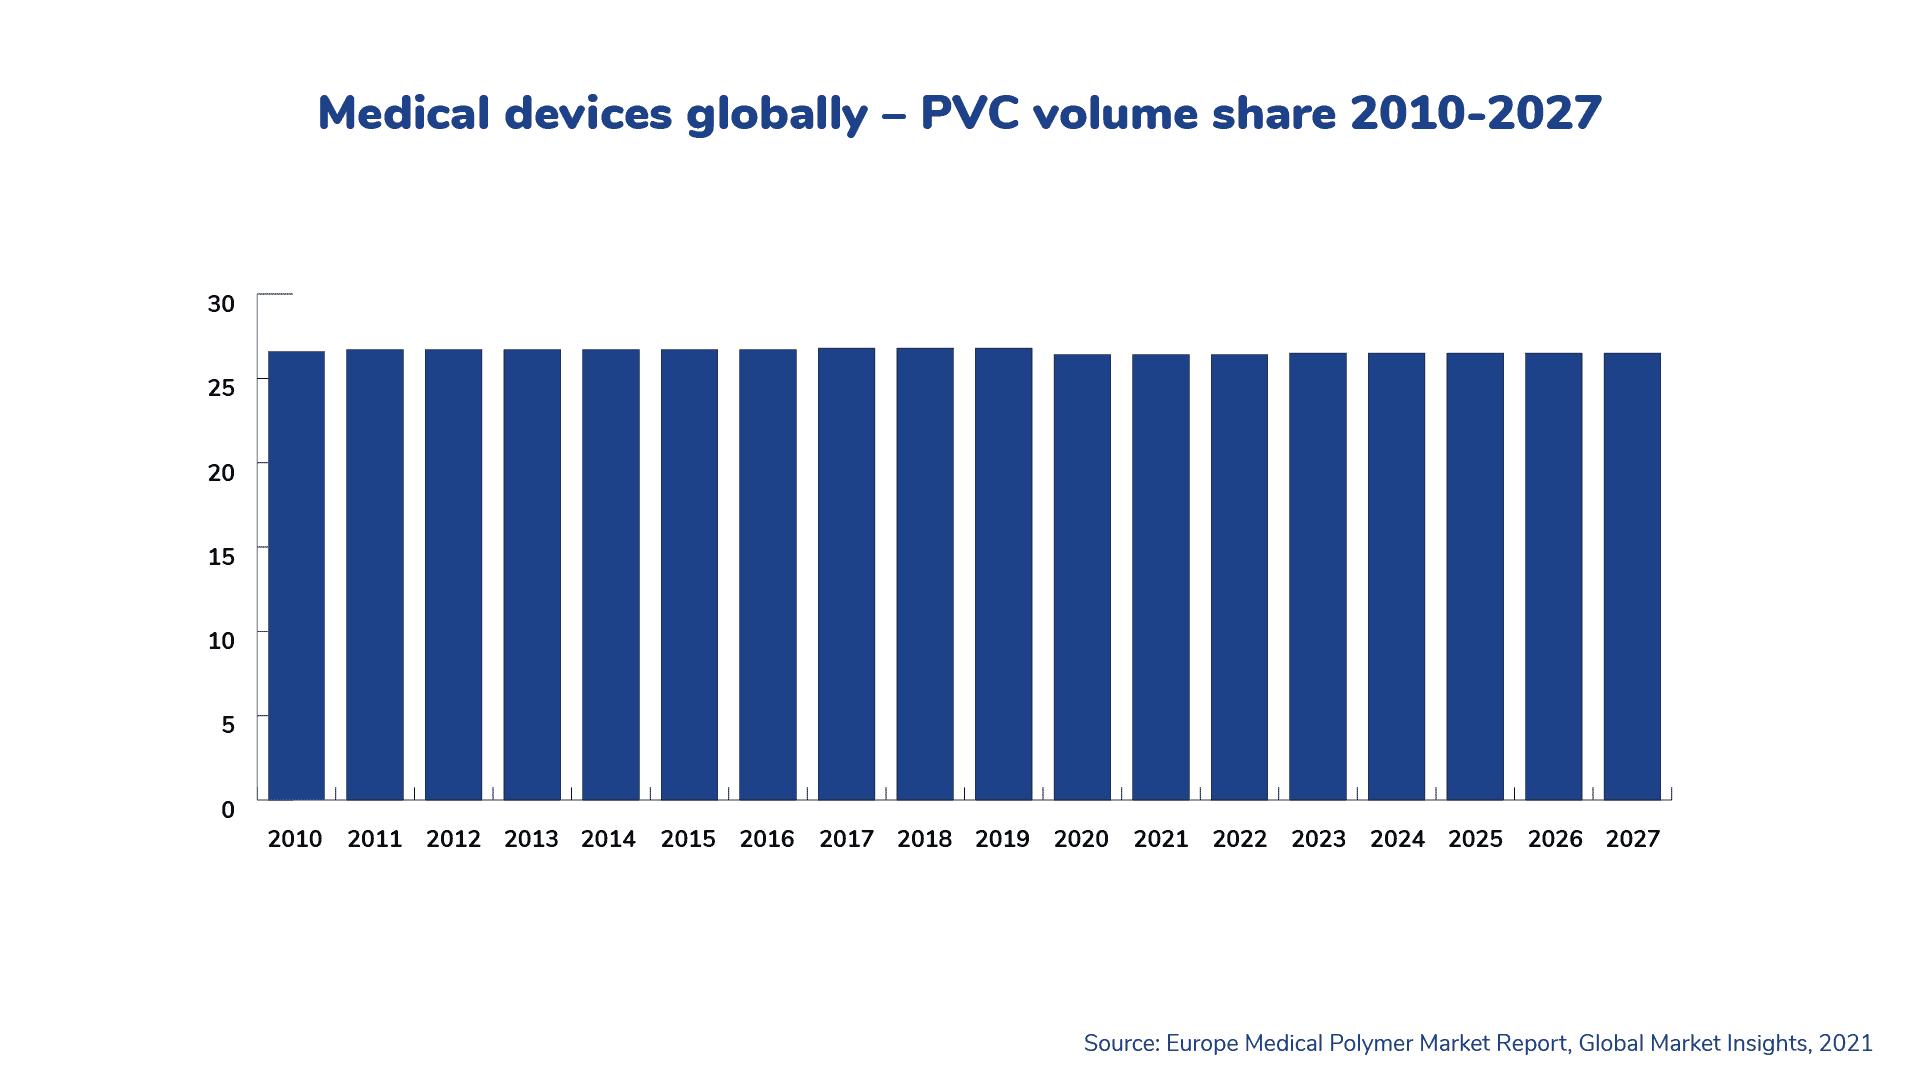 pvc_2010-2027_global